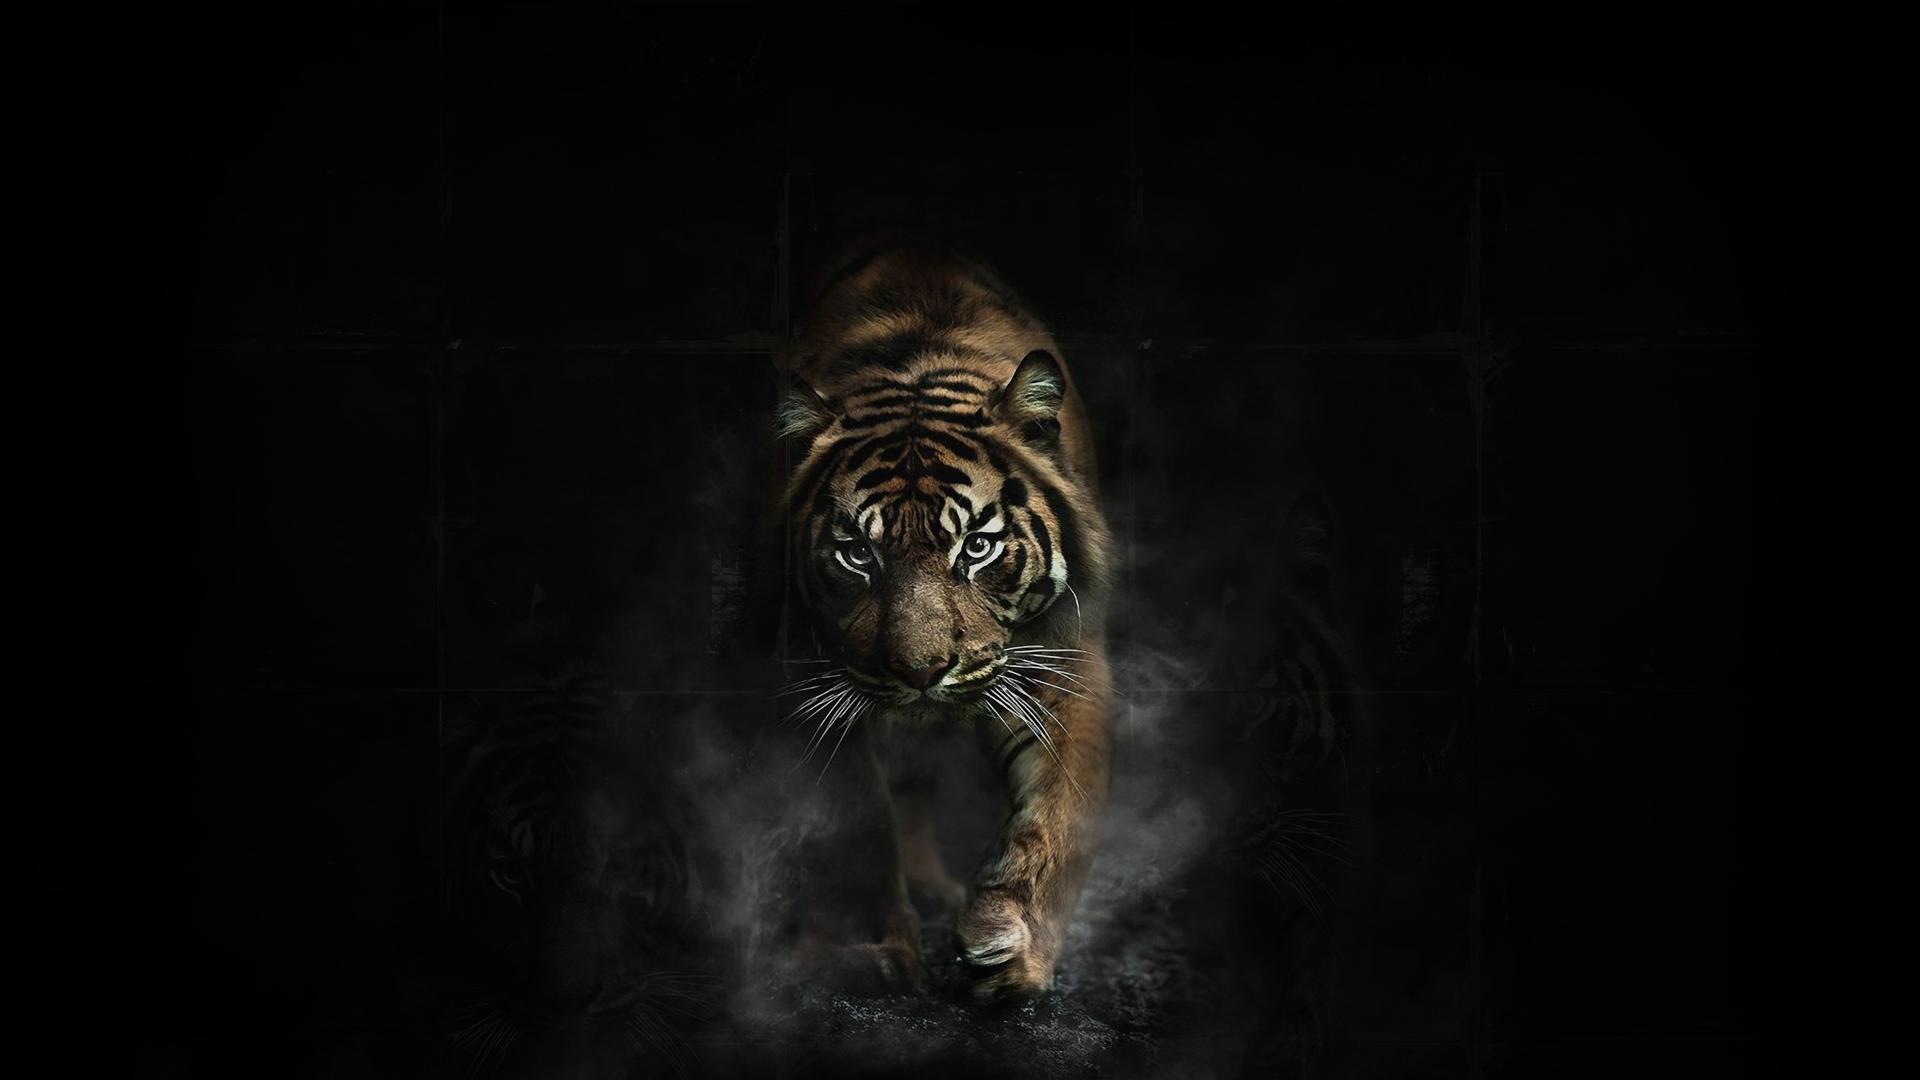 1920X1080 Tiger Wallpaper Full HD - WallpaperSafari